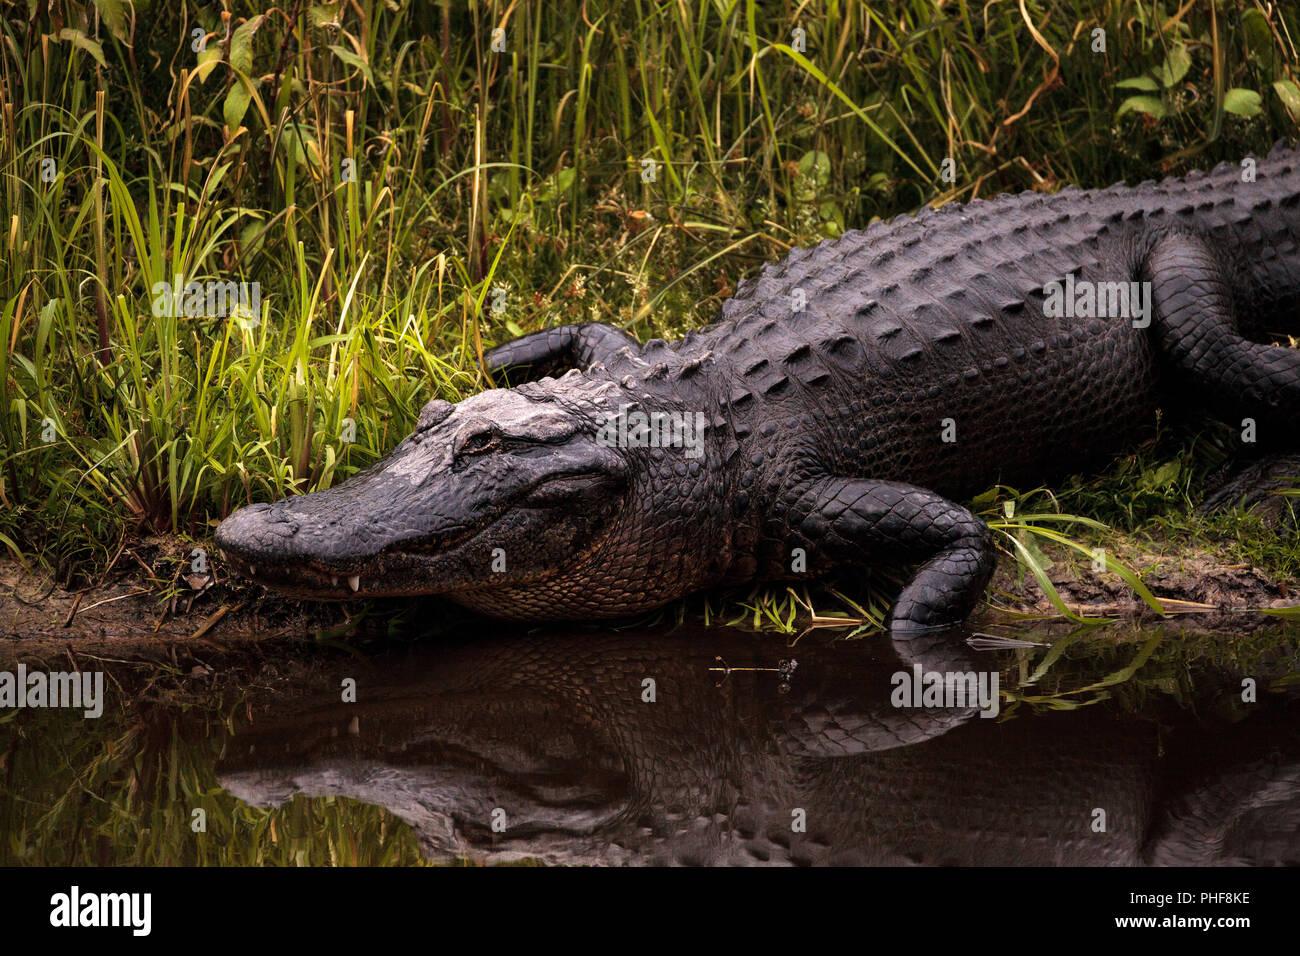 Large menacing American alligator Alligator mississippiensis - Stock Image